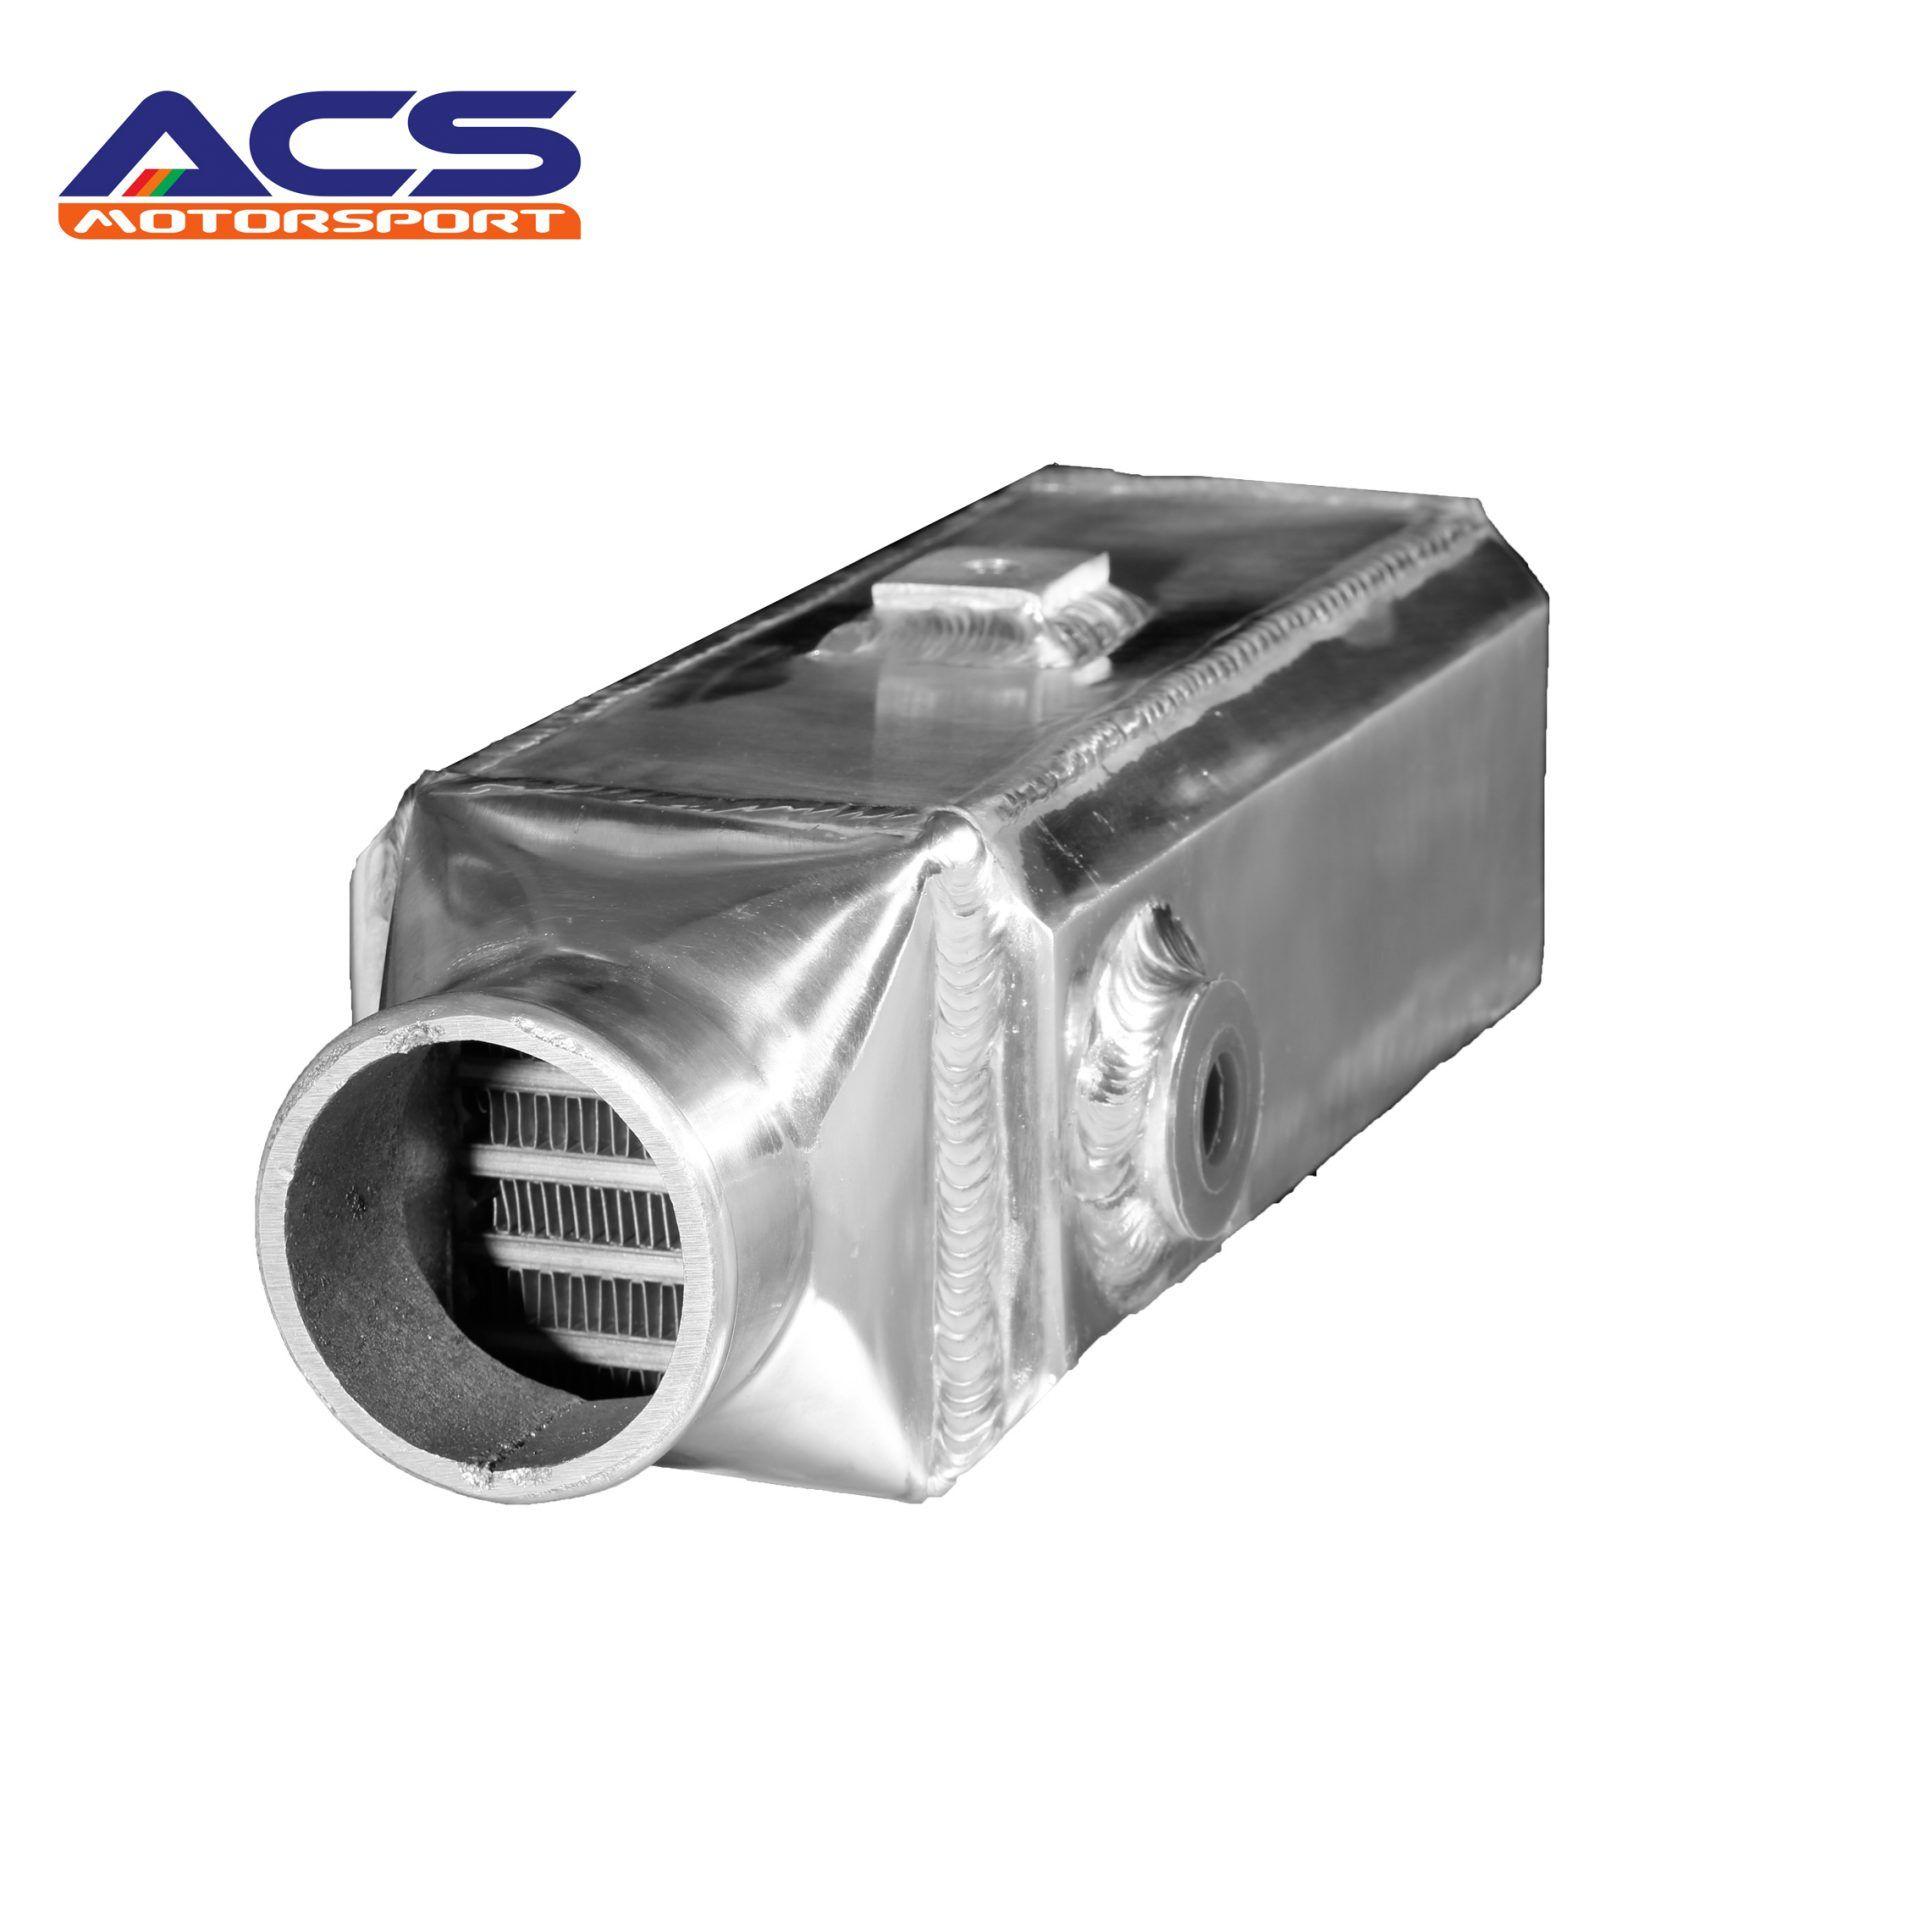 25 ROW Universal Aluminum Engine Transmission Oil Cooler